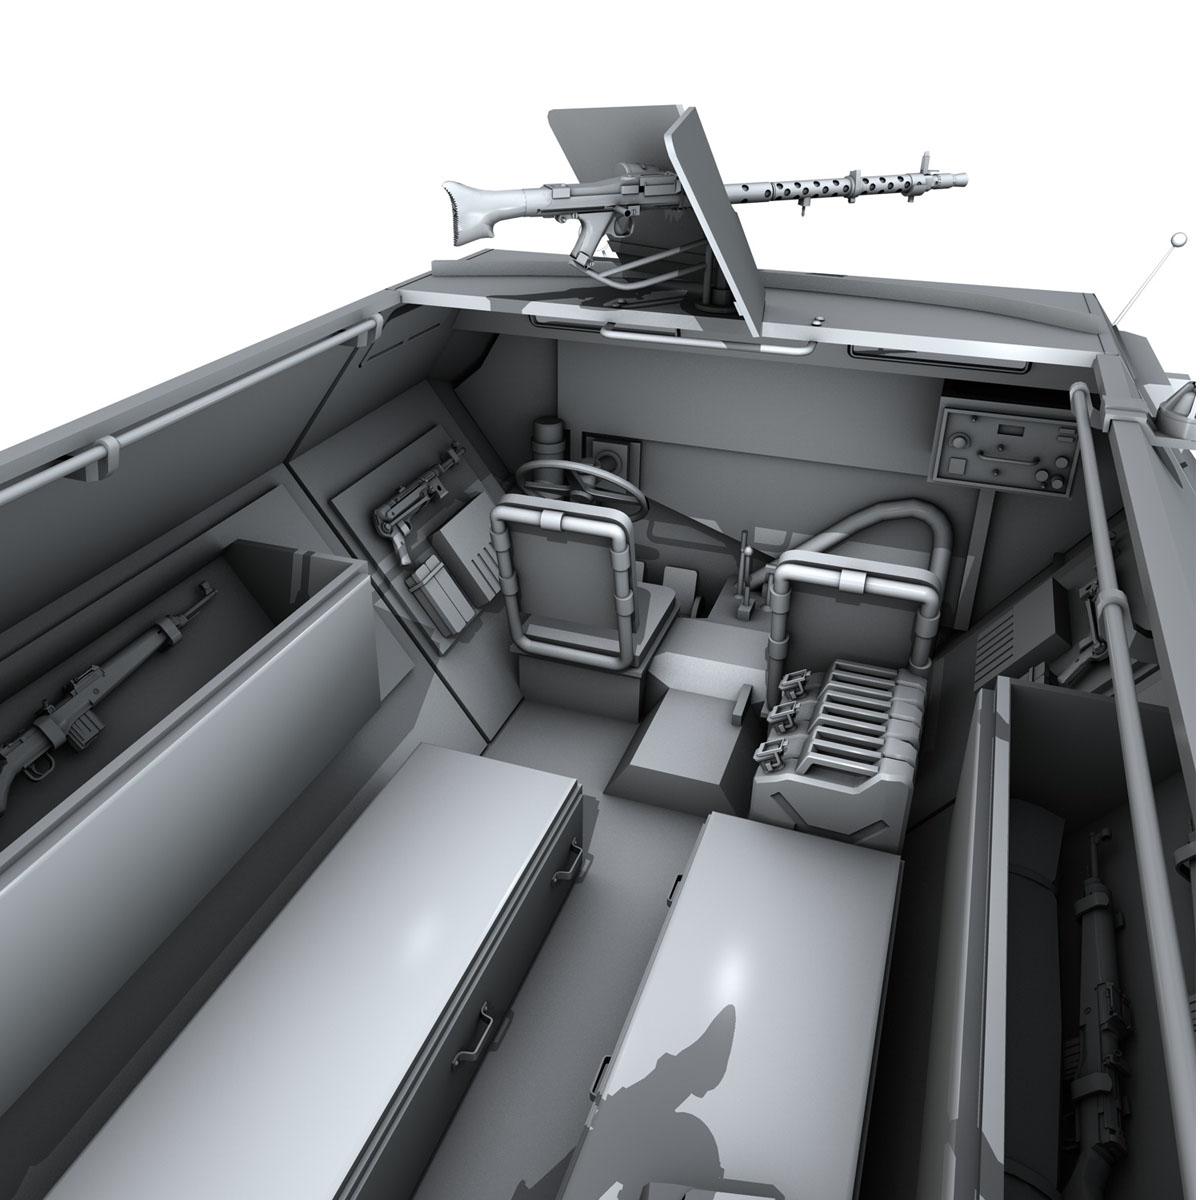 sd.kfz 251/1 ausf.c – hanomag halftruck 3d model 3ds fbx c4d lwo obj 201171